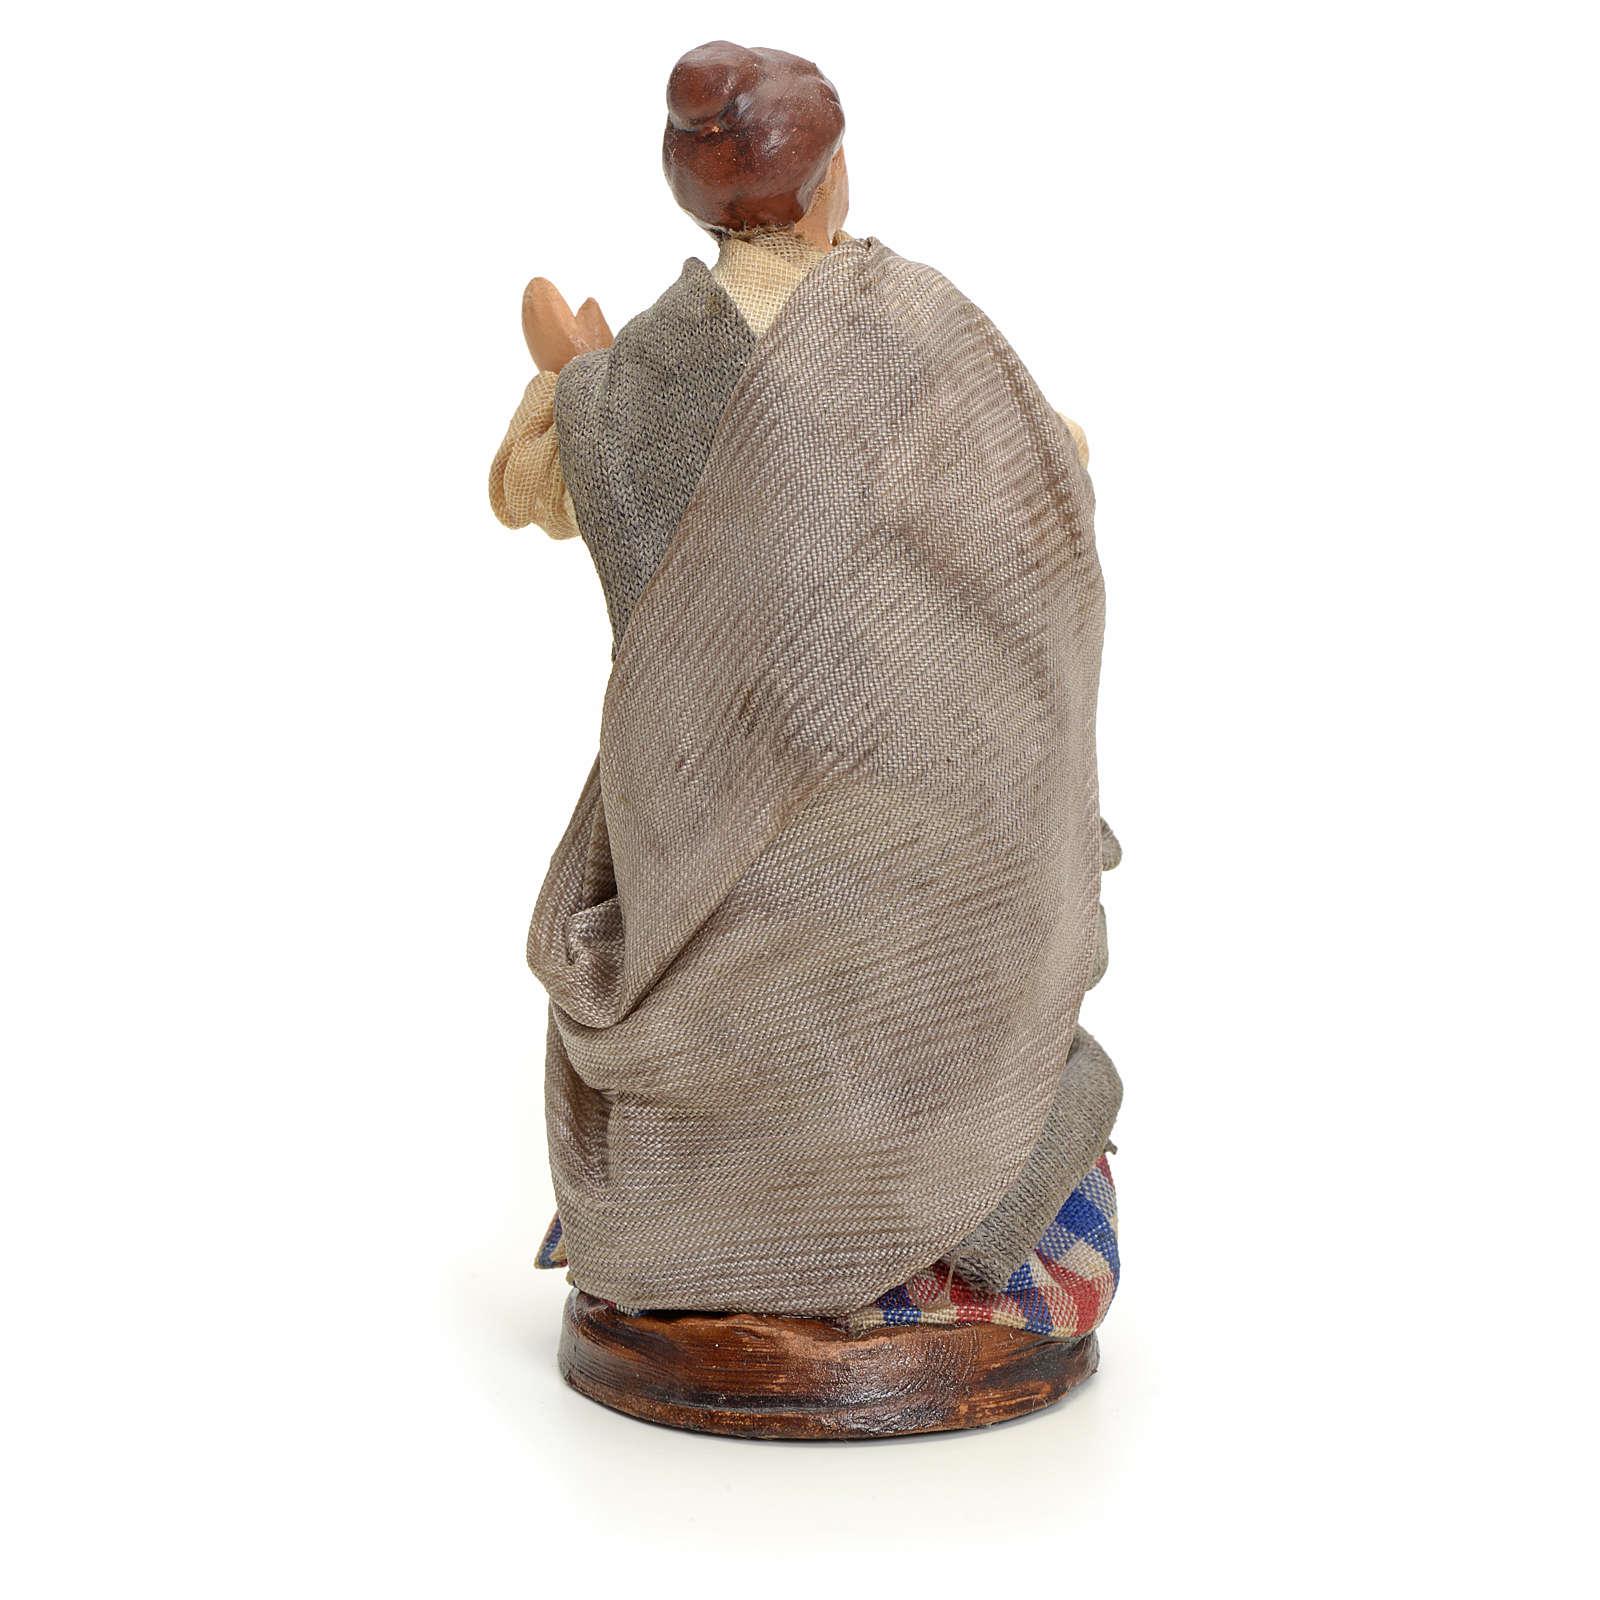 Neapolitan nativity figurine, woman at the balcony, 8cm 4